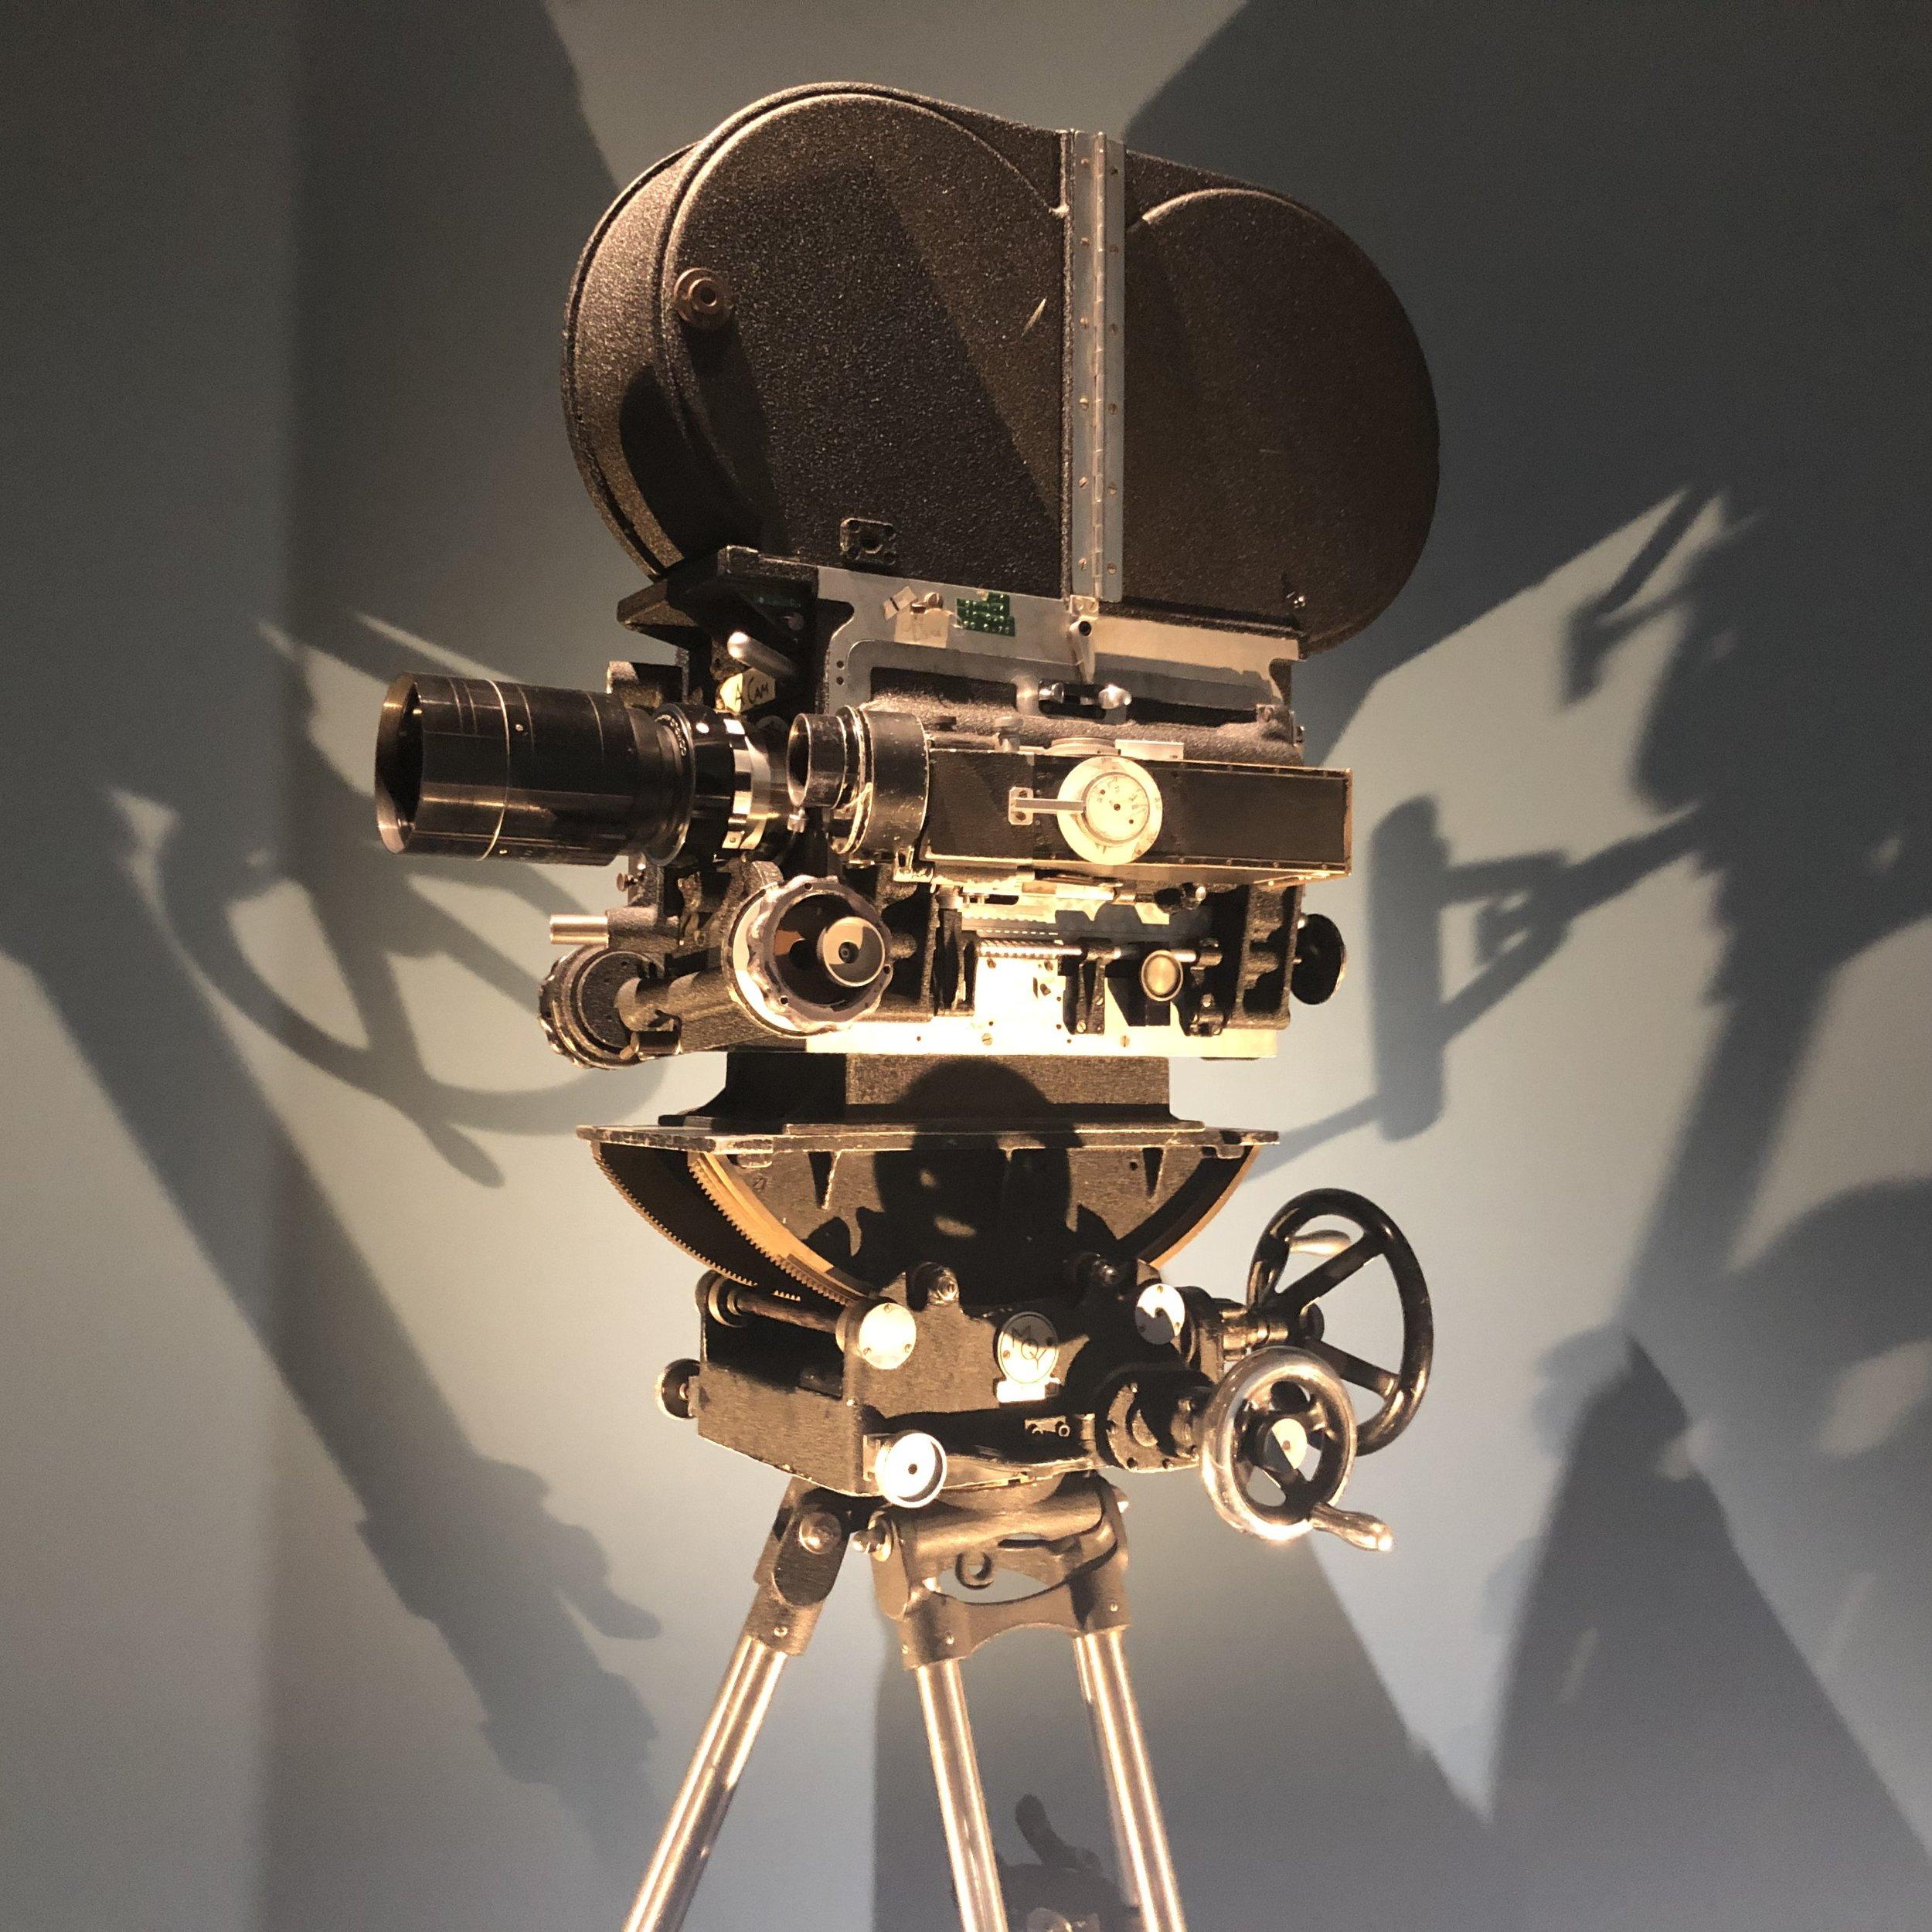 Kubrick's camera — one of many